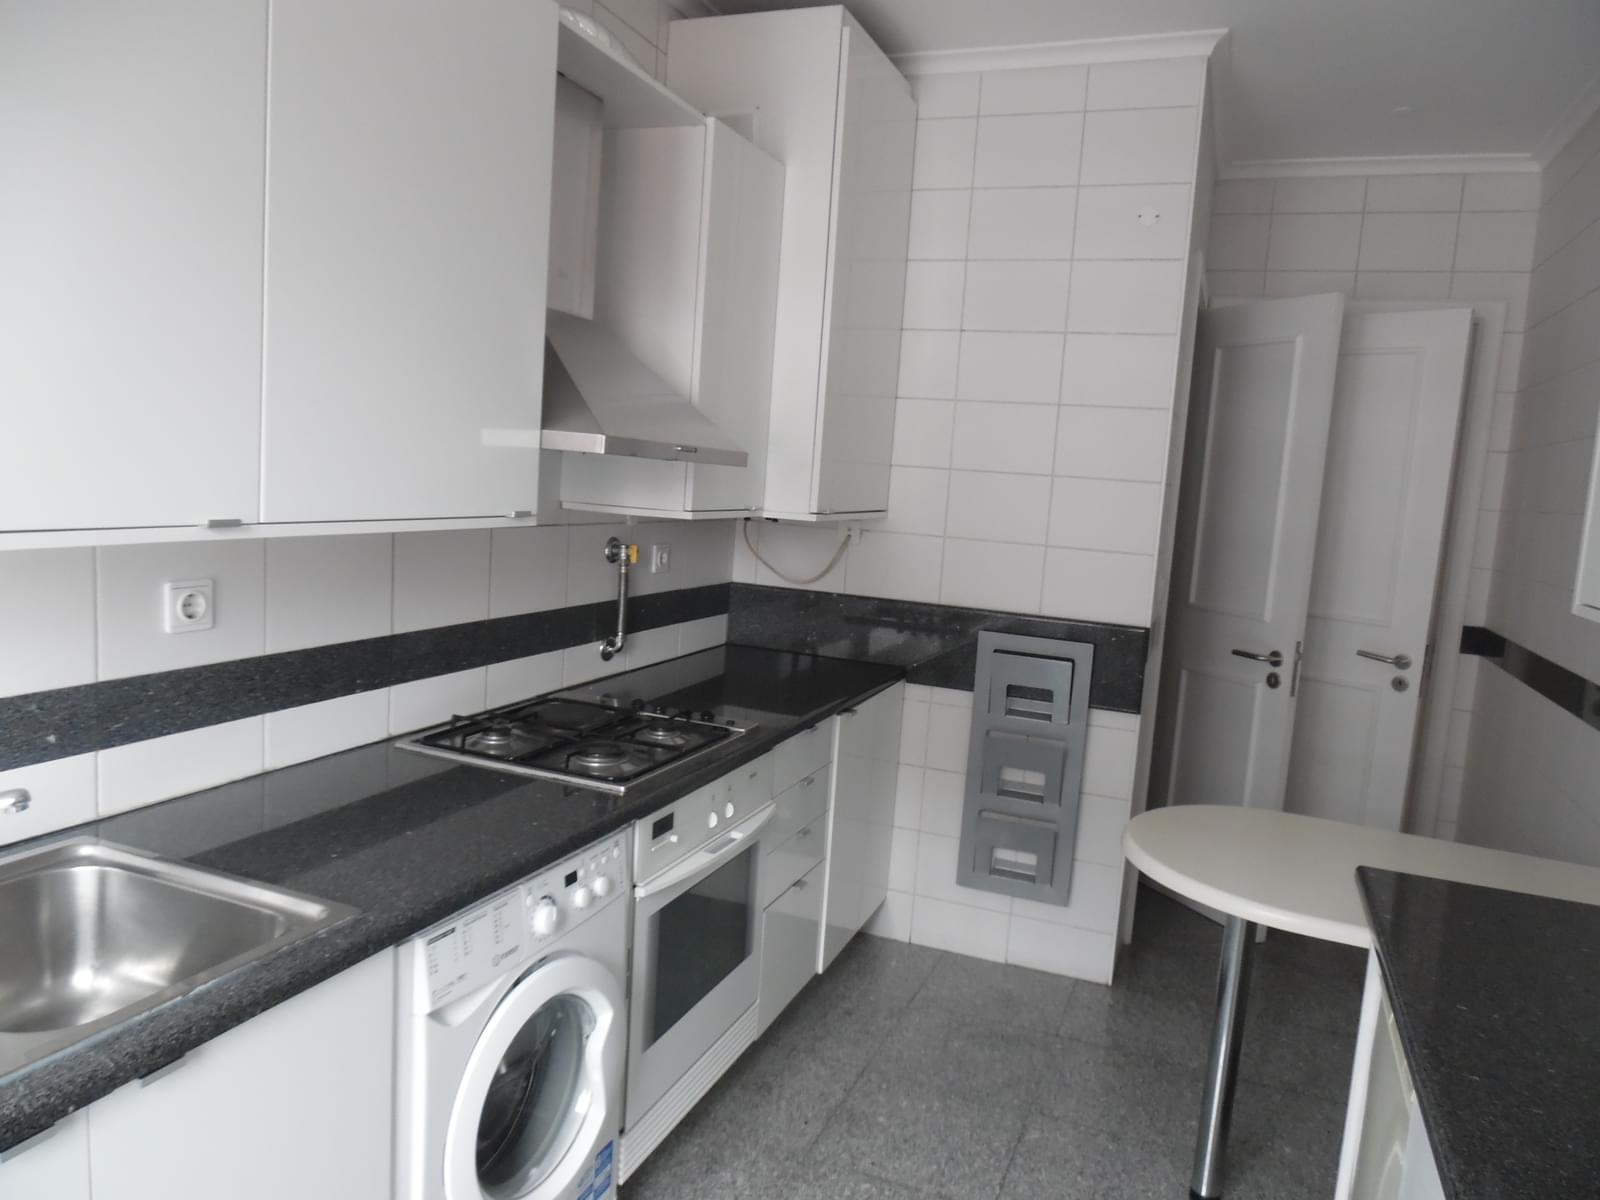 pf17637-apartamento-t2-lisboa-095e021c-9325-4bcd-ae0b-28ca7cbefa14